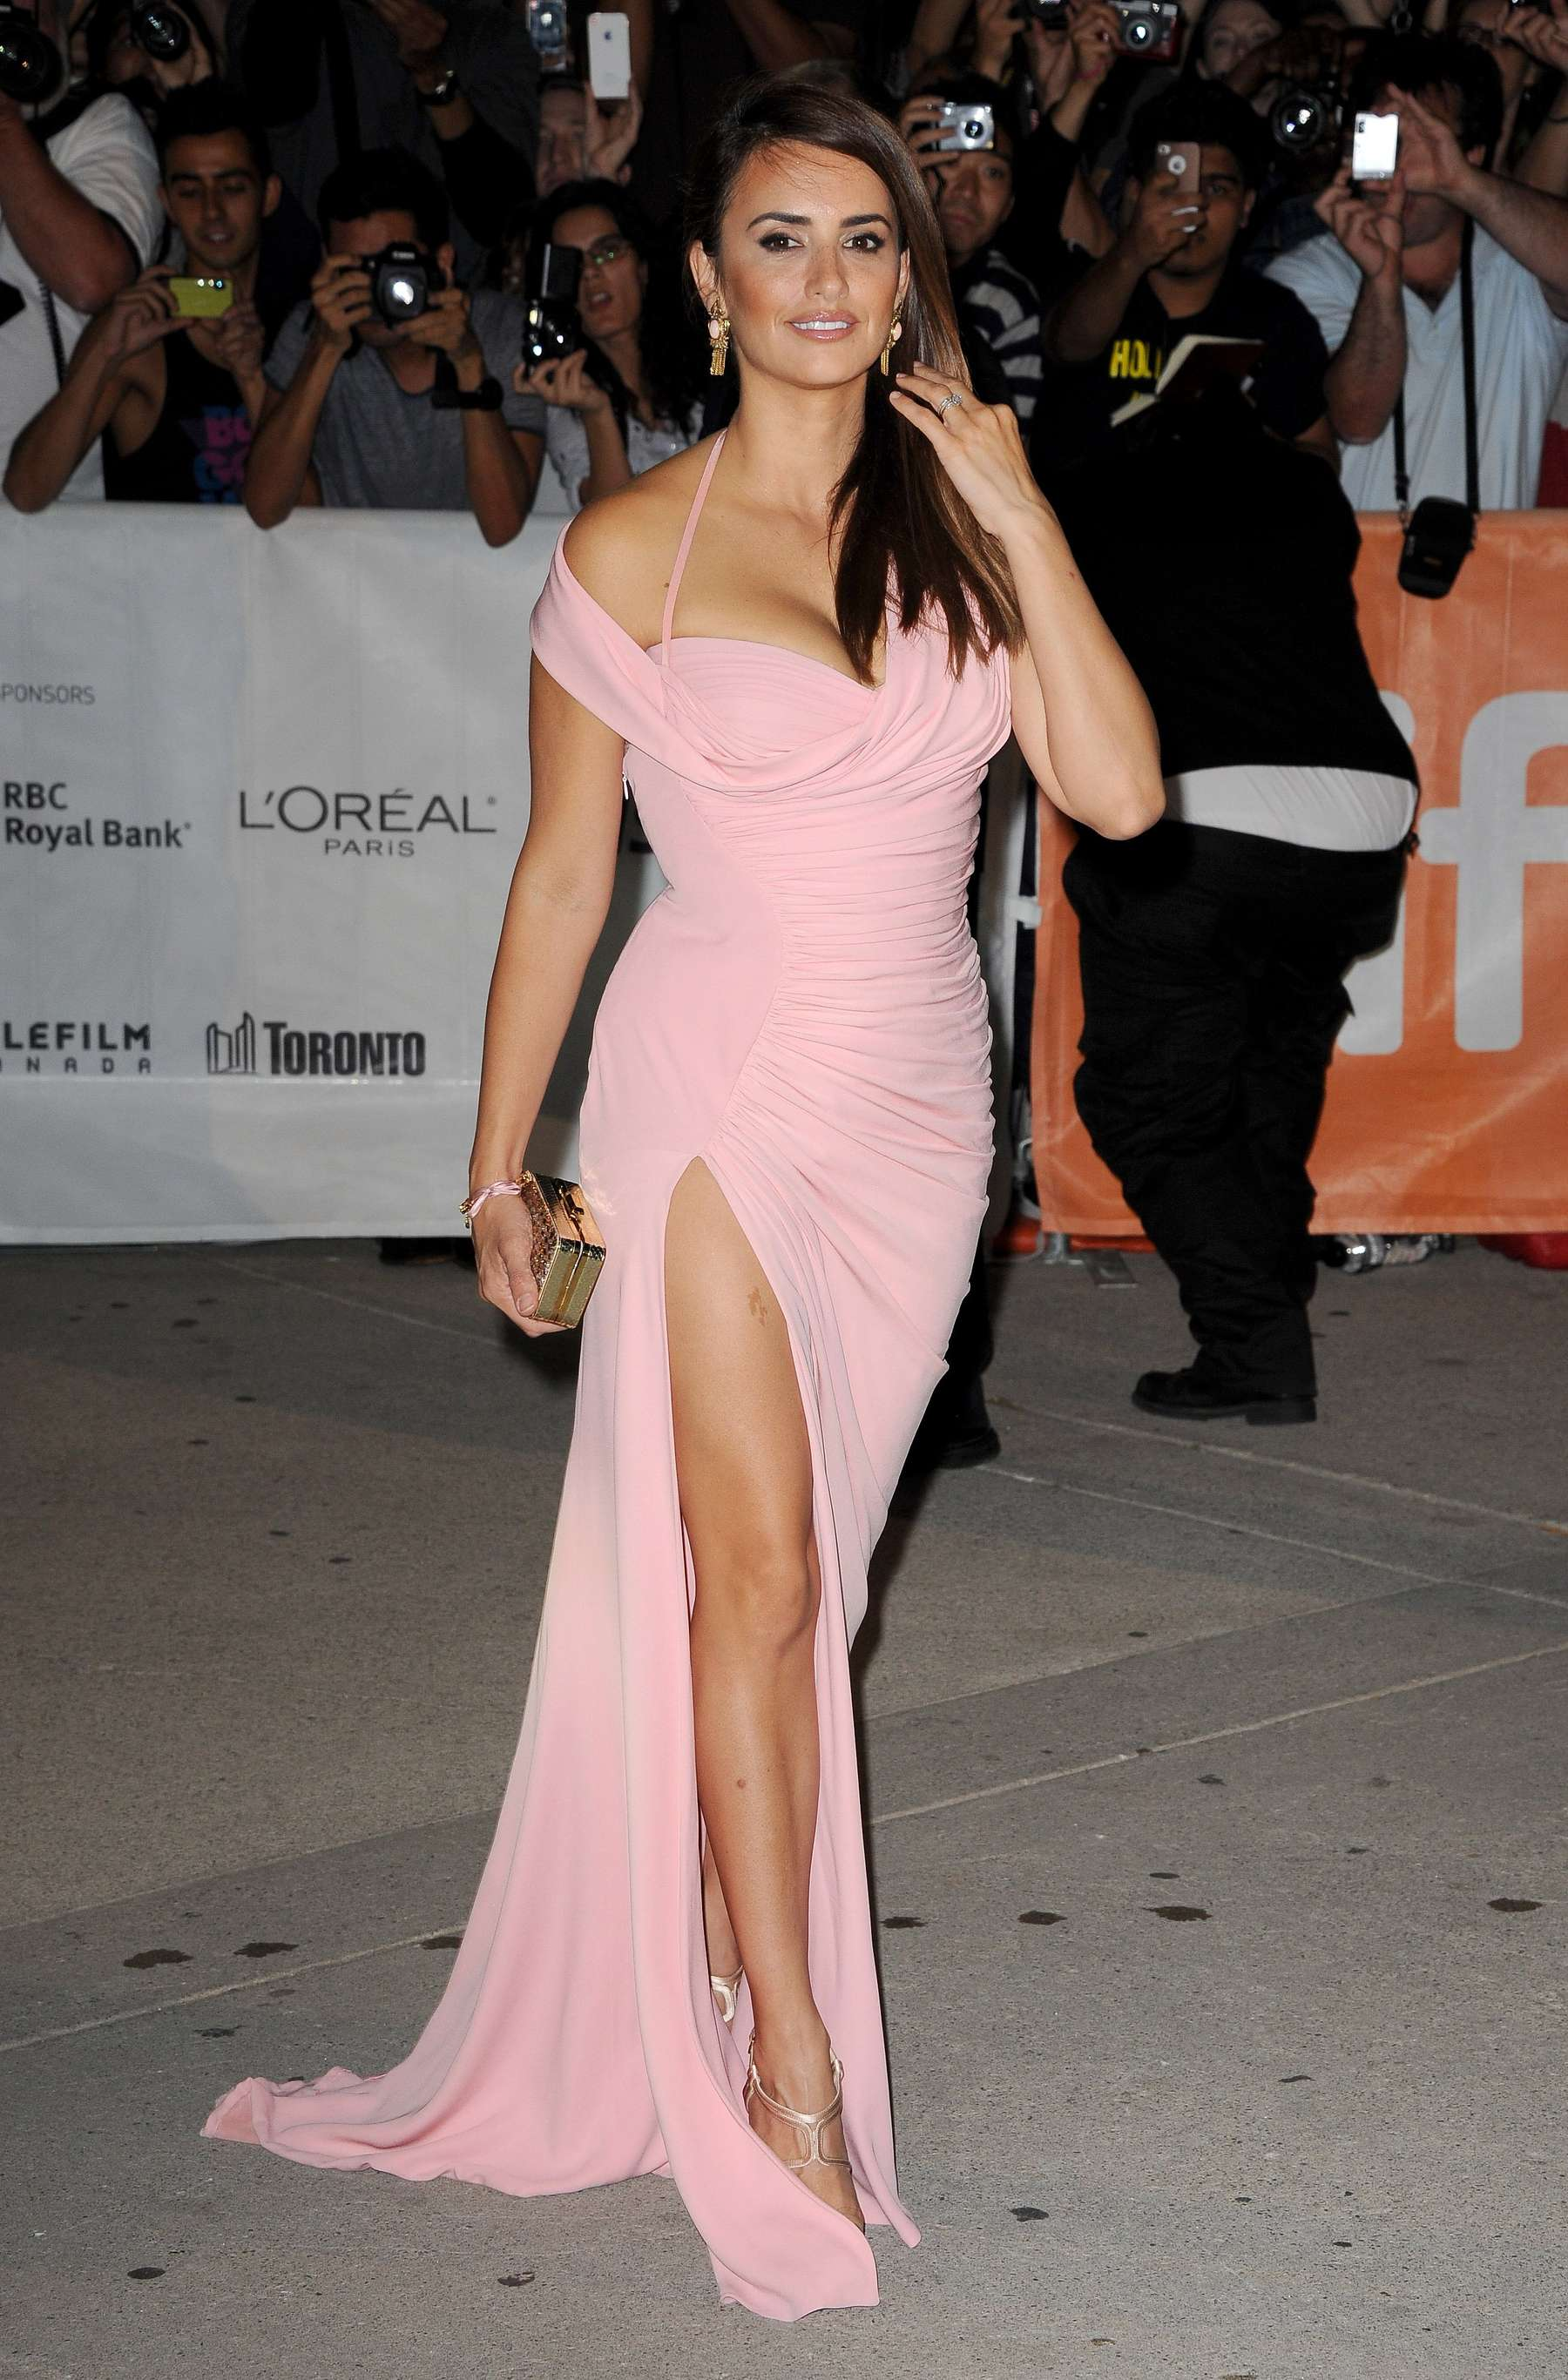 Cleavage Penelope Cruz nudes (21 pics), Ass